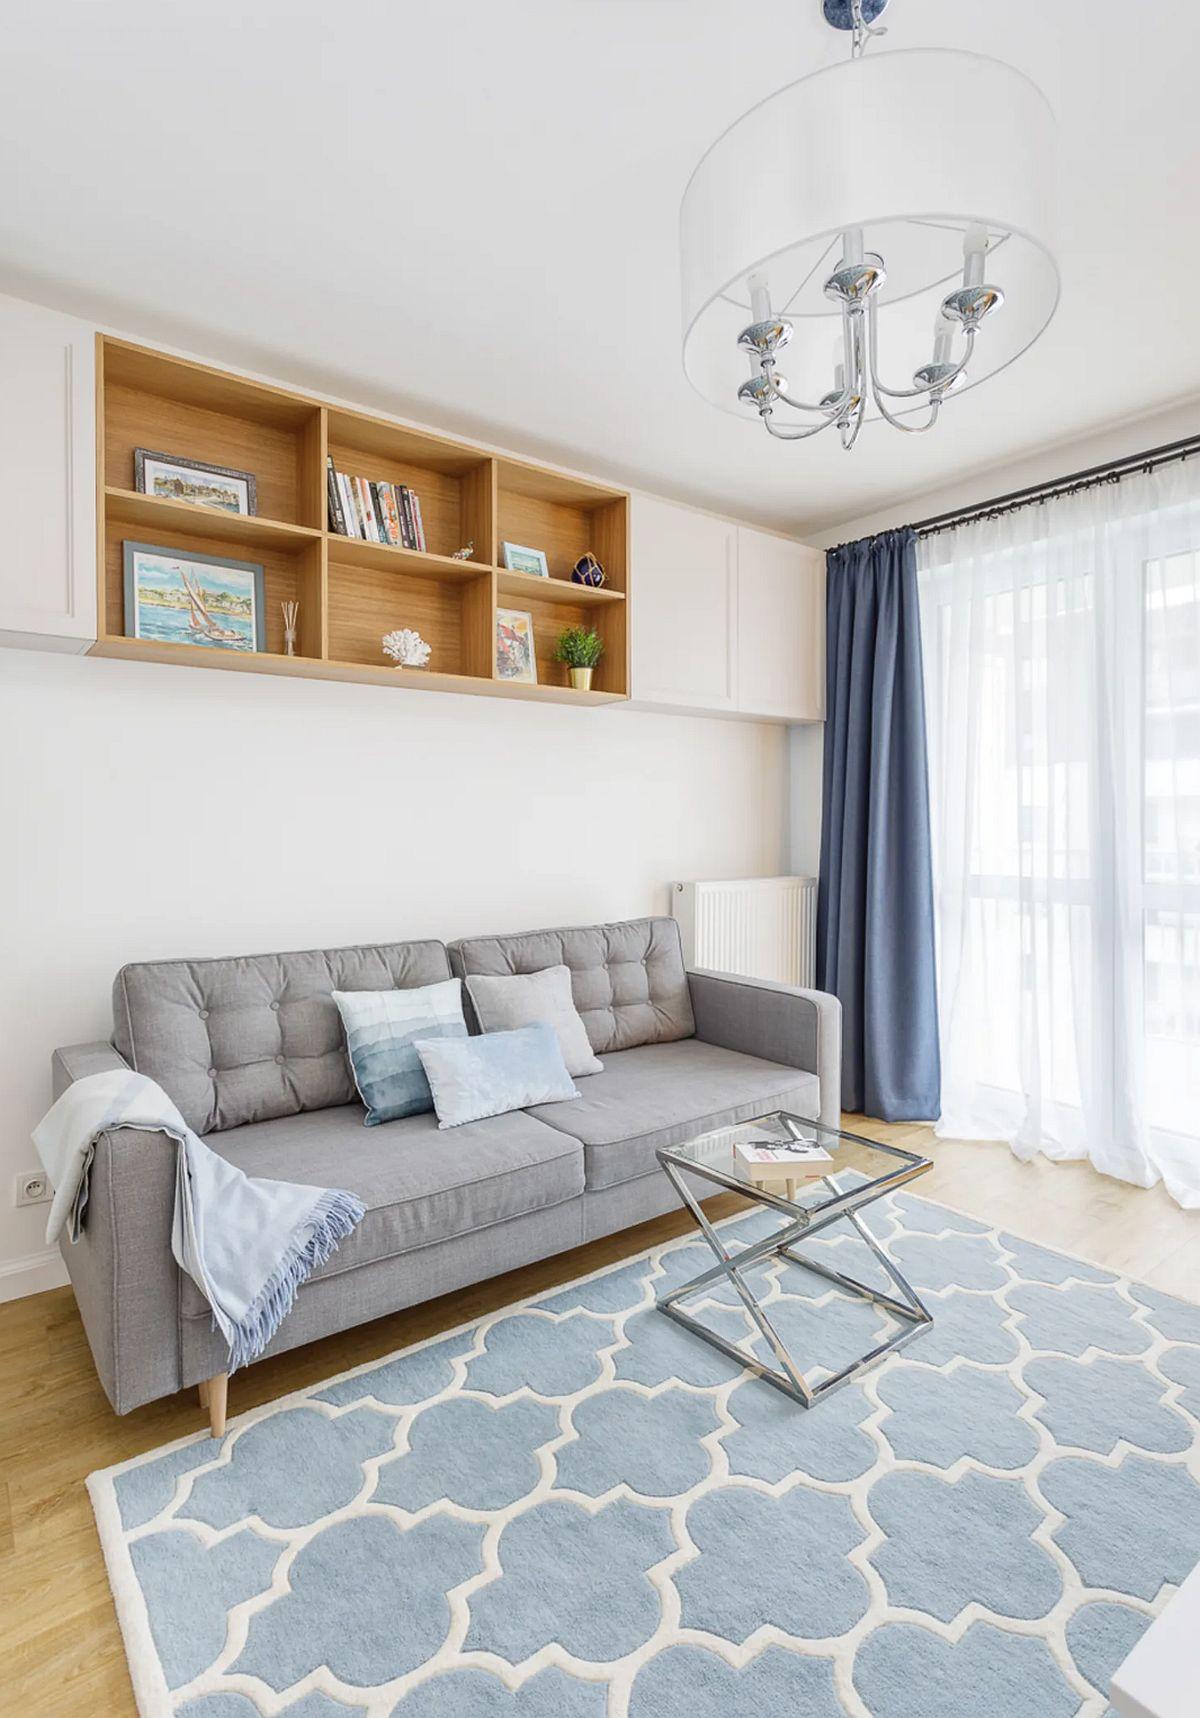 adelaparvu.com despre apartament 40 mp in stil marin, design Zawicka-ID, Foto Michal Mlynarczyk (12)